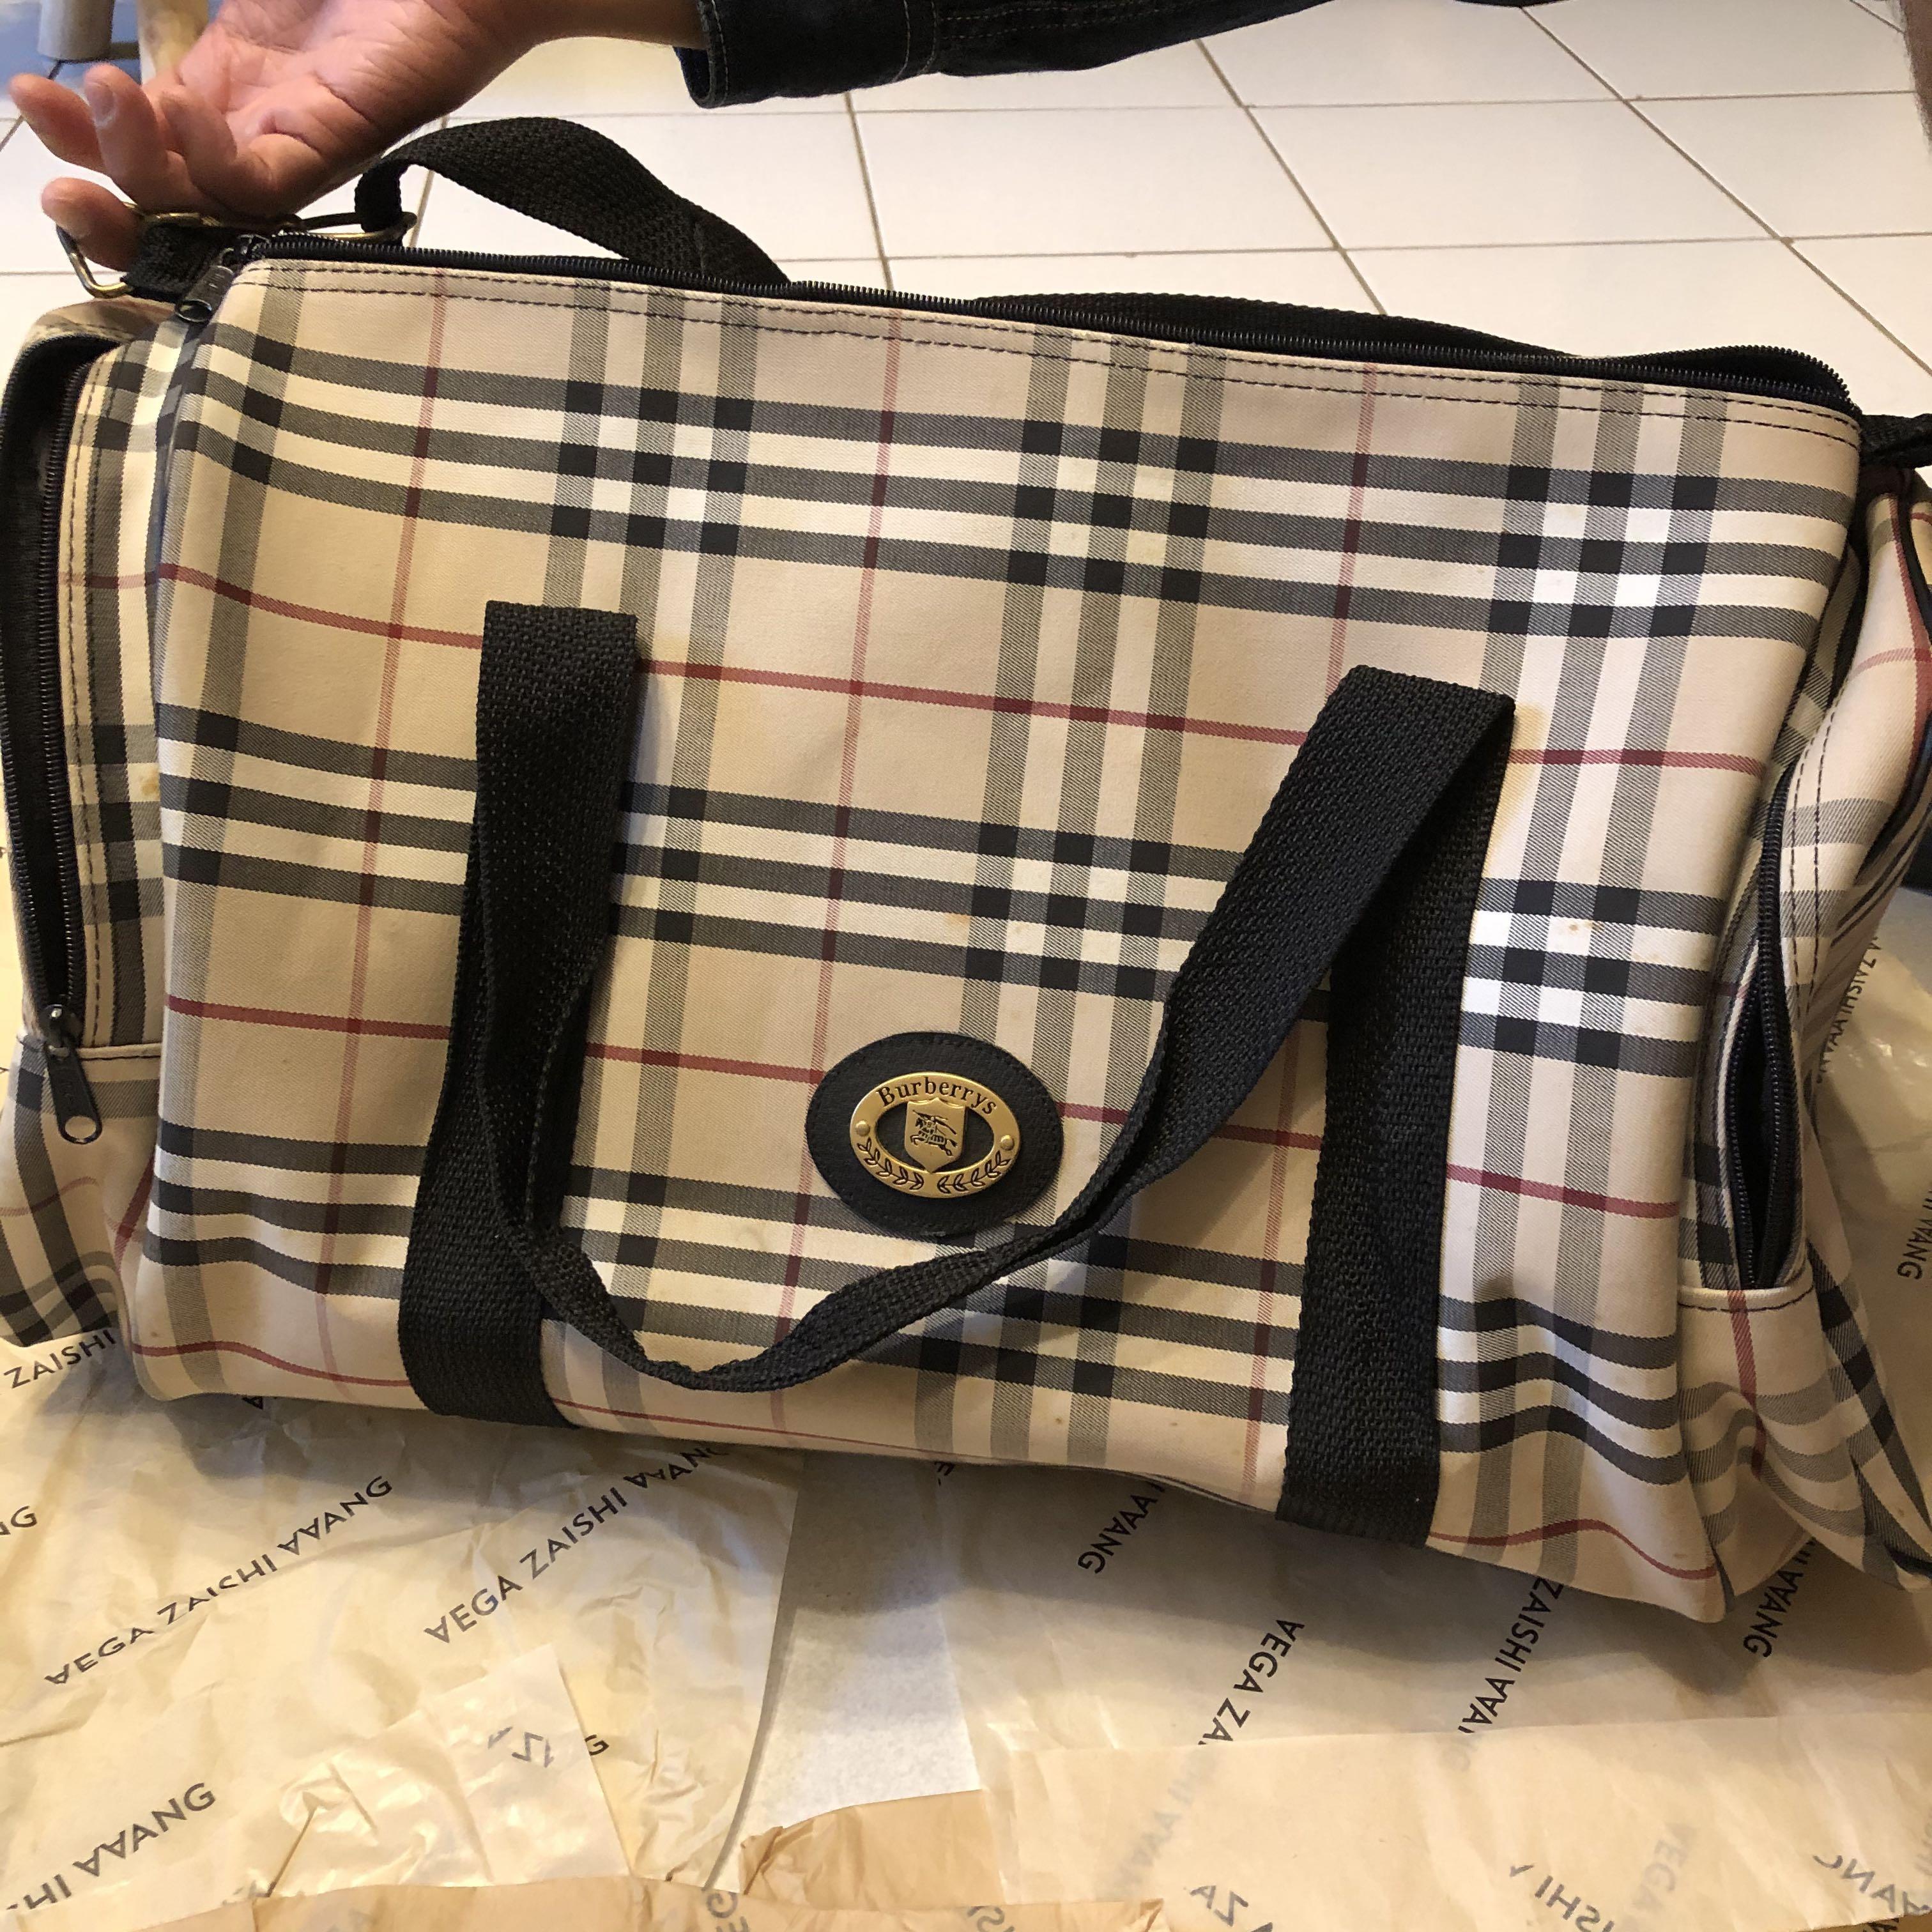 Burberry 經典格紋行李袋 行李側背包(資訊待補)